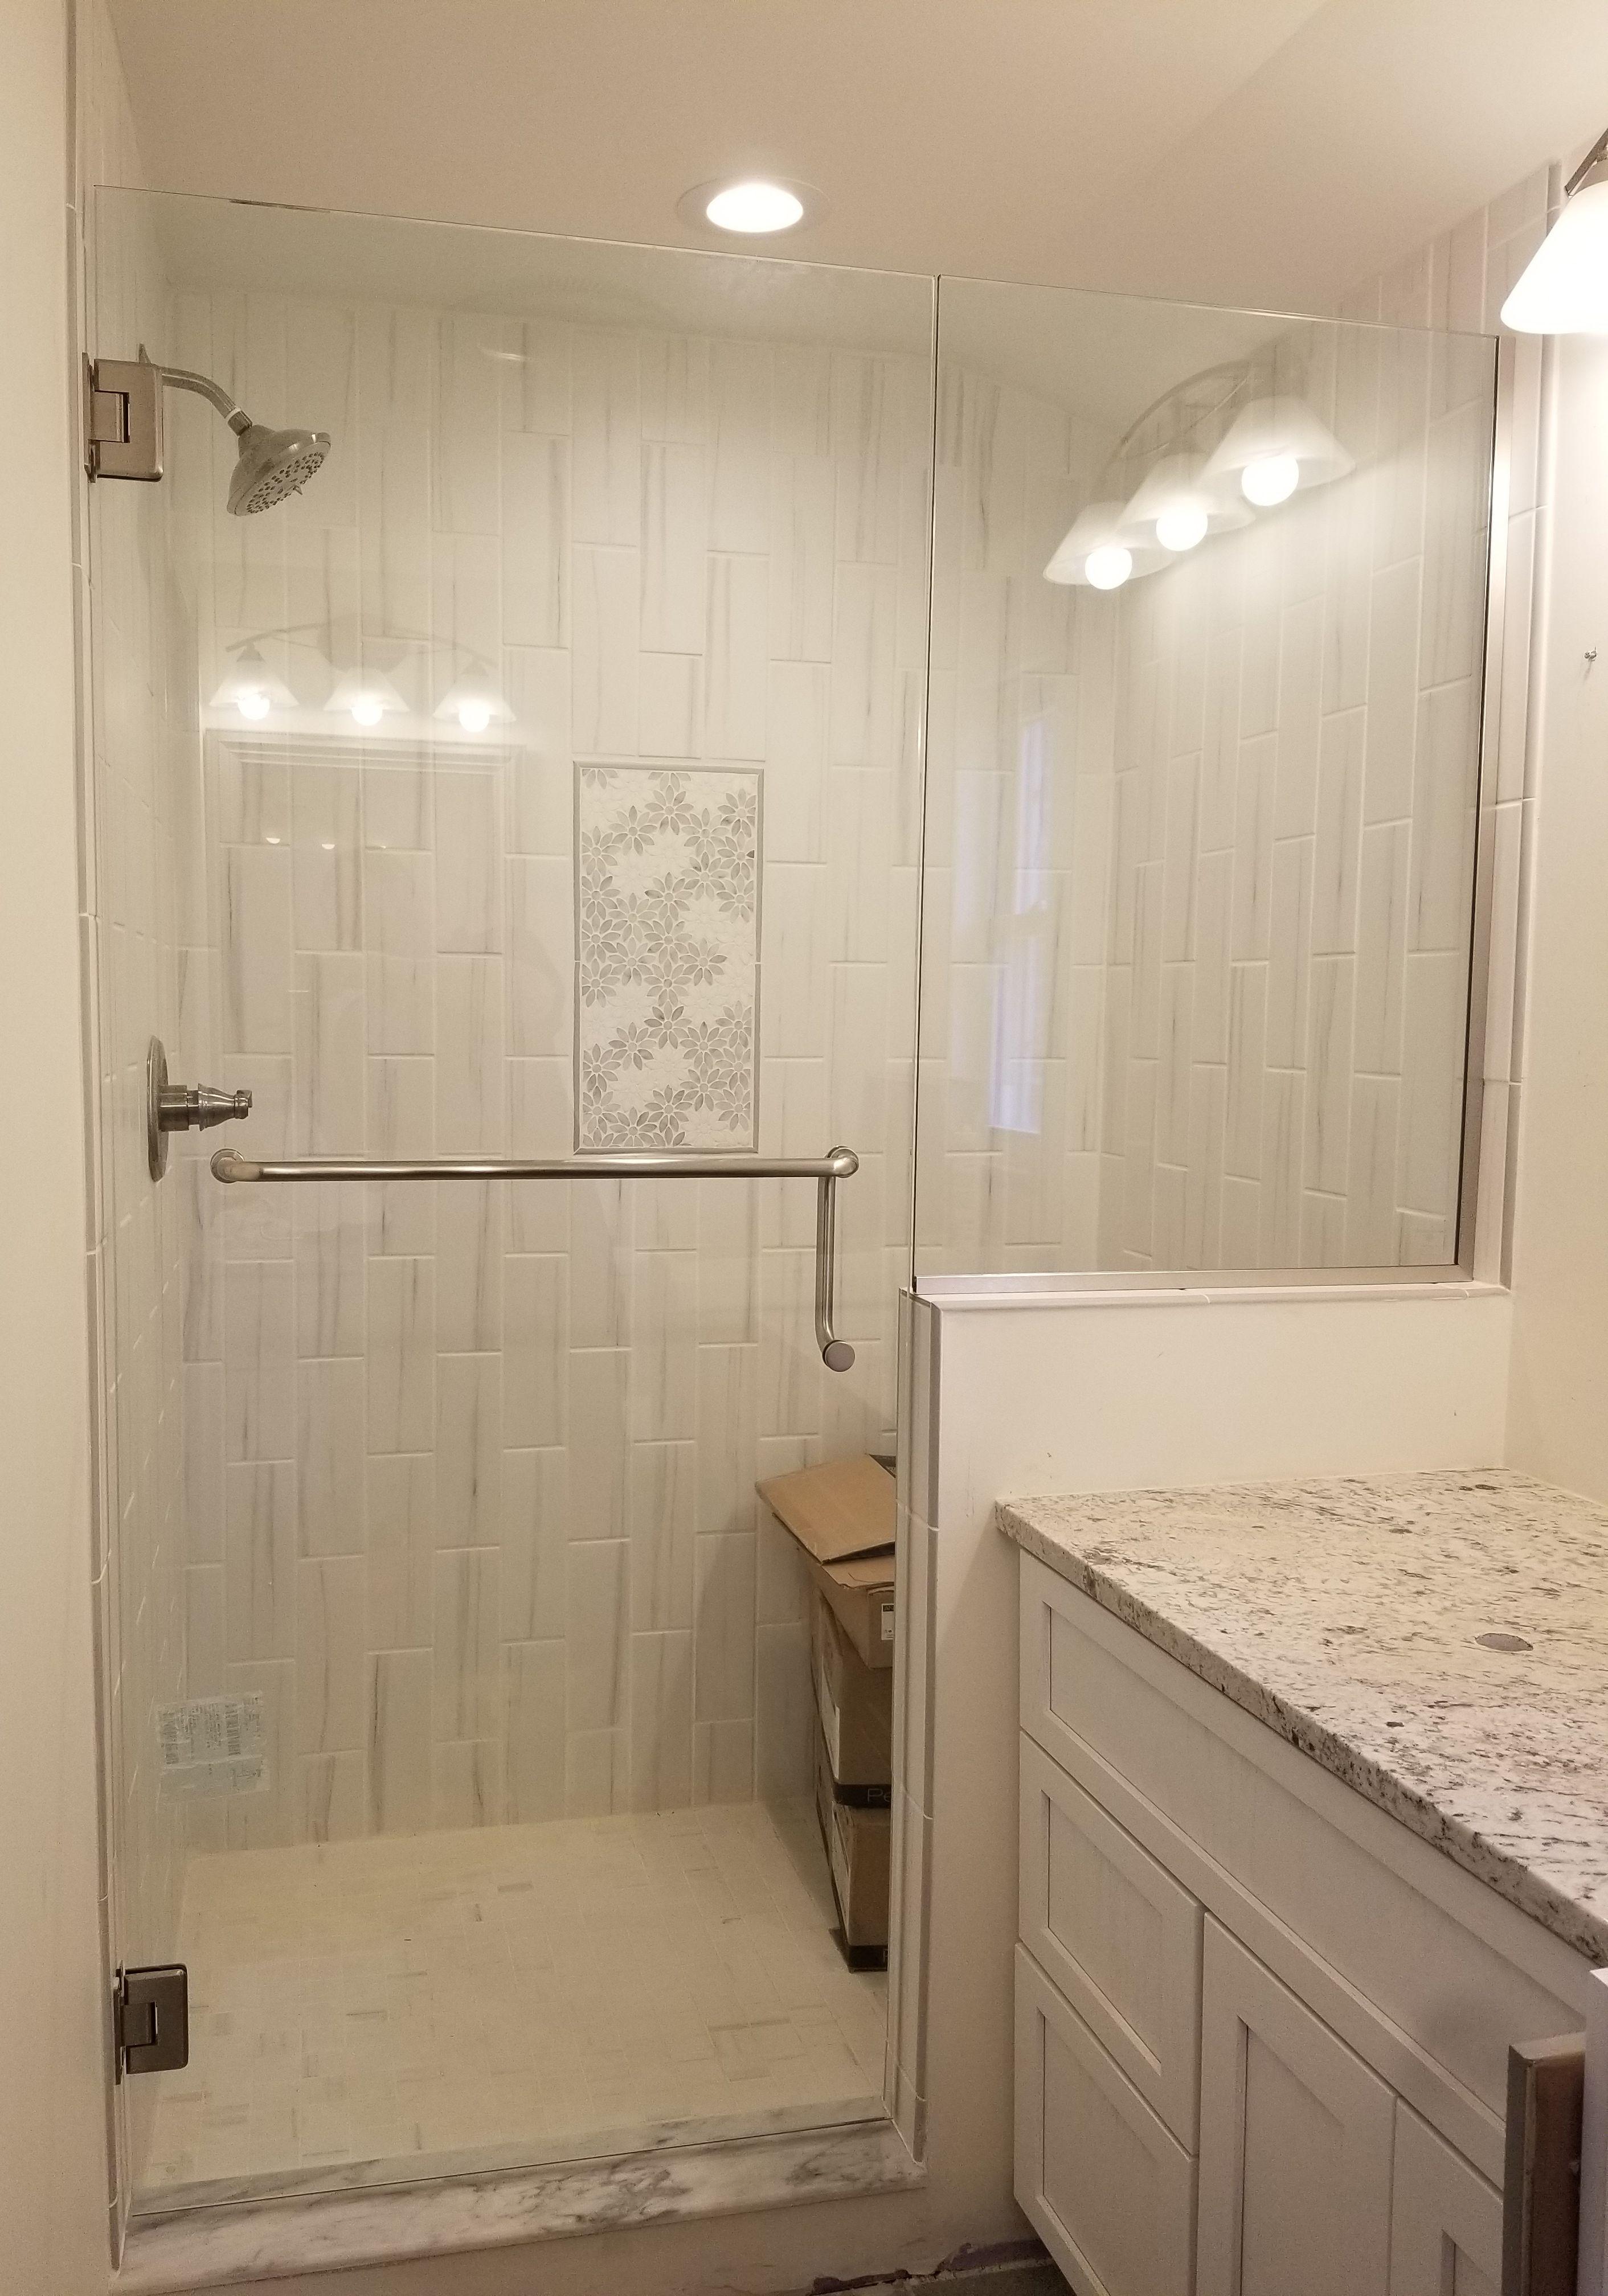 panel door with brushed nickel handle towel bar combo from shower rh pinterest com